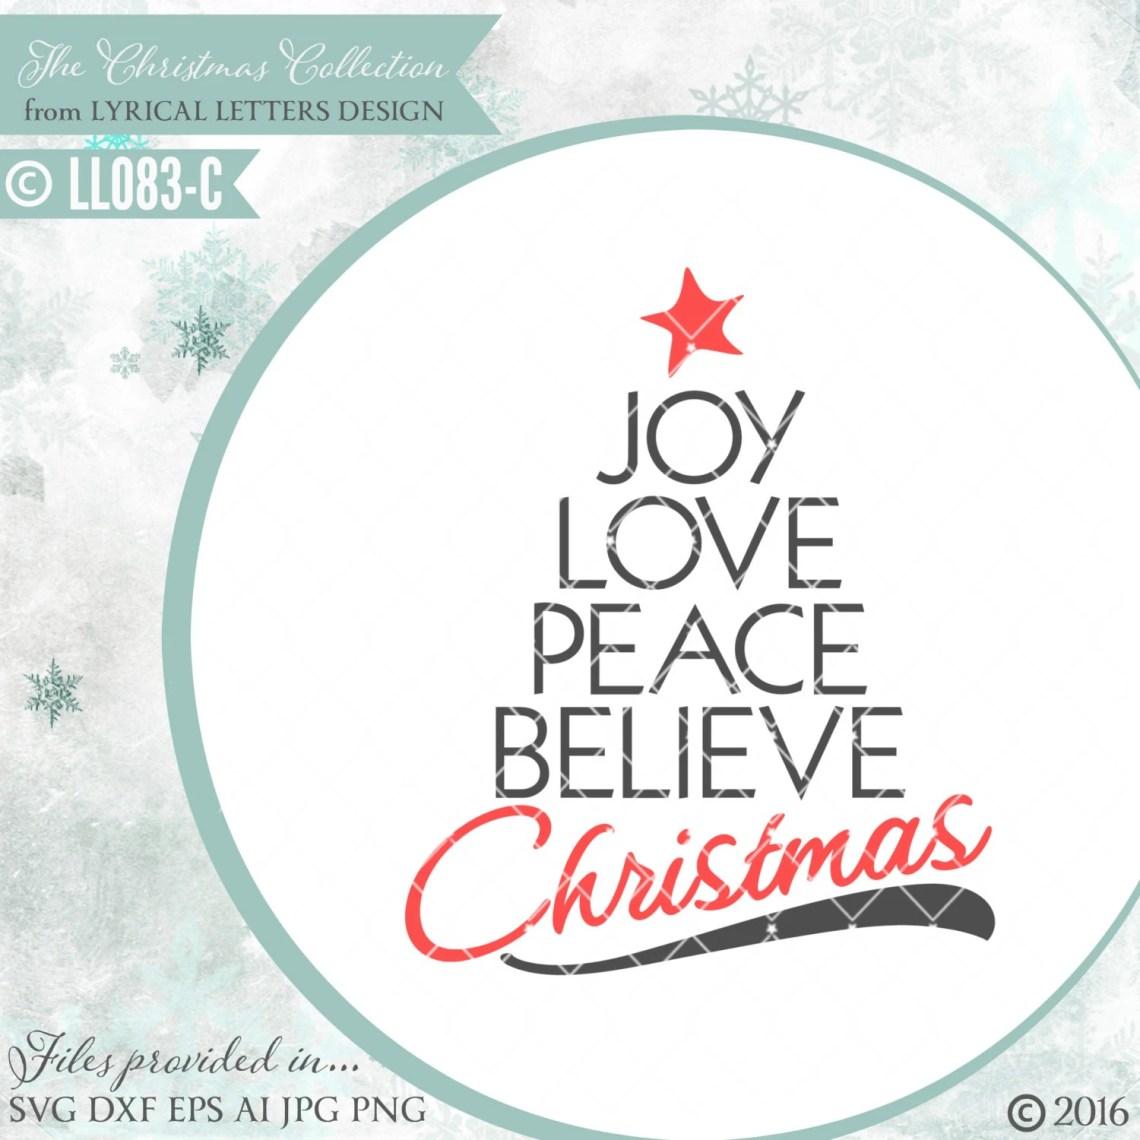 Download Joy Love Peace Believe Christmas LL083 C SVG Vector